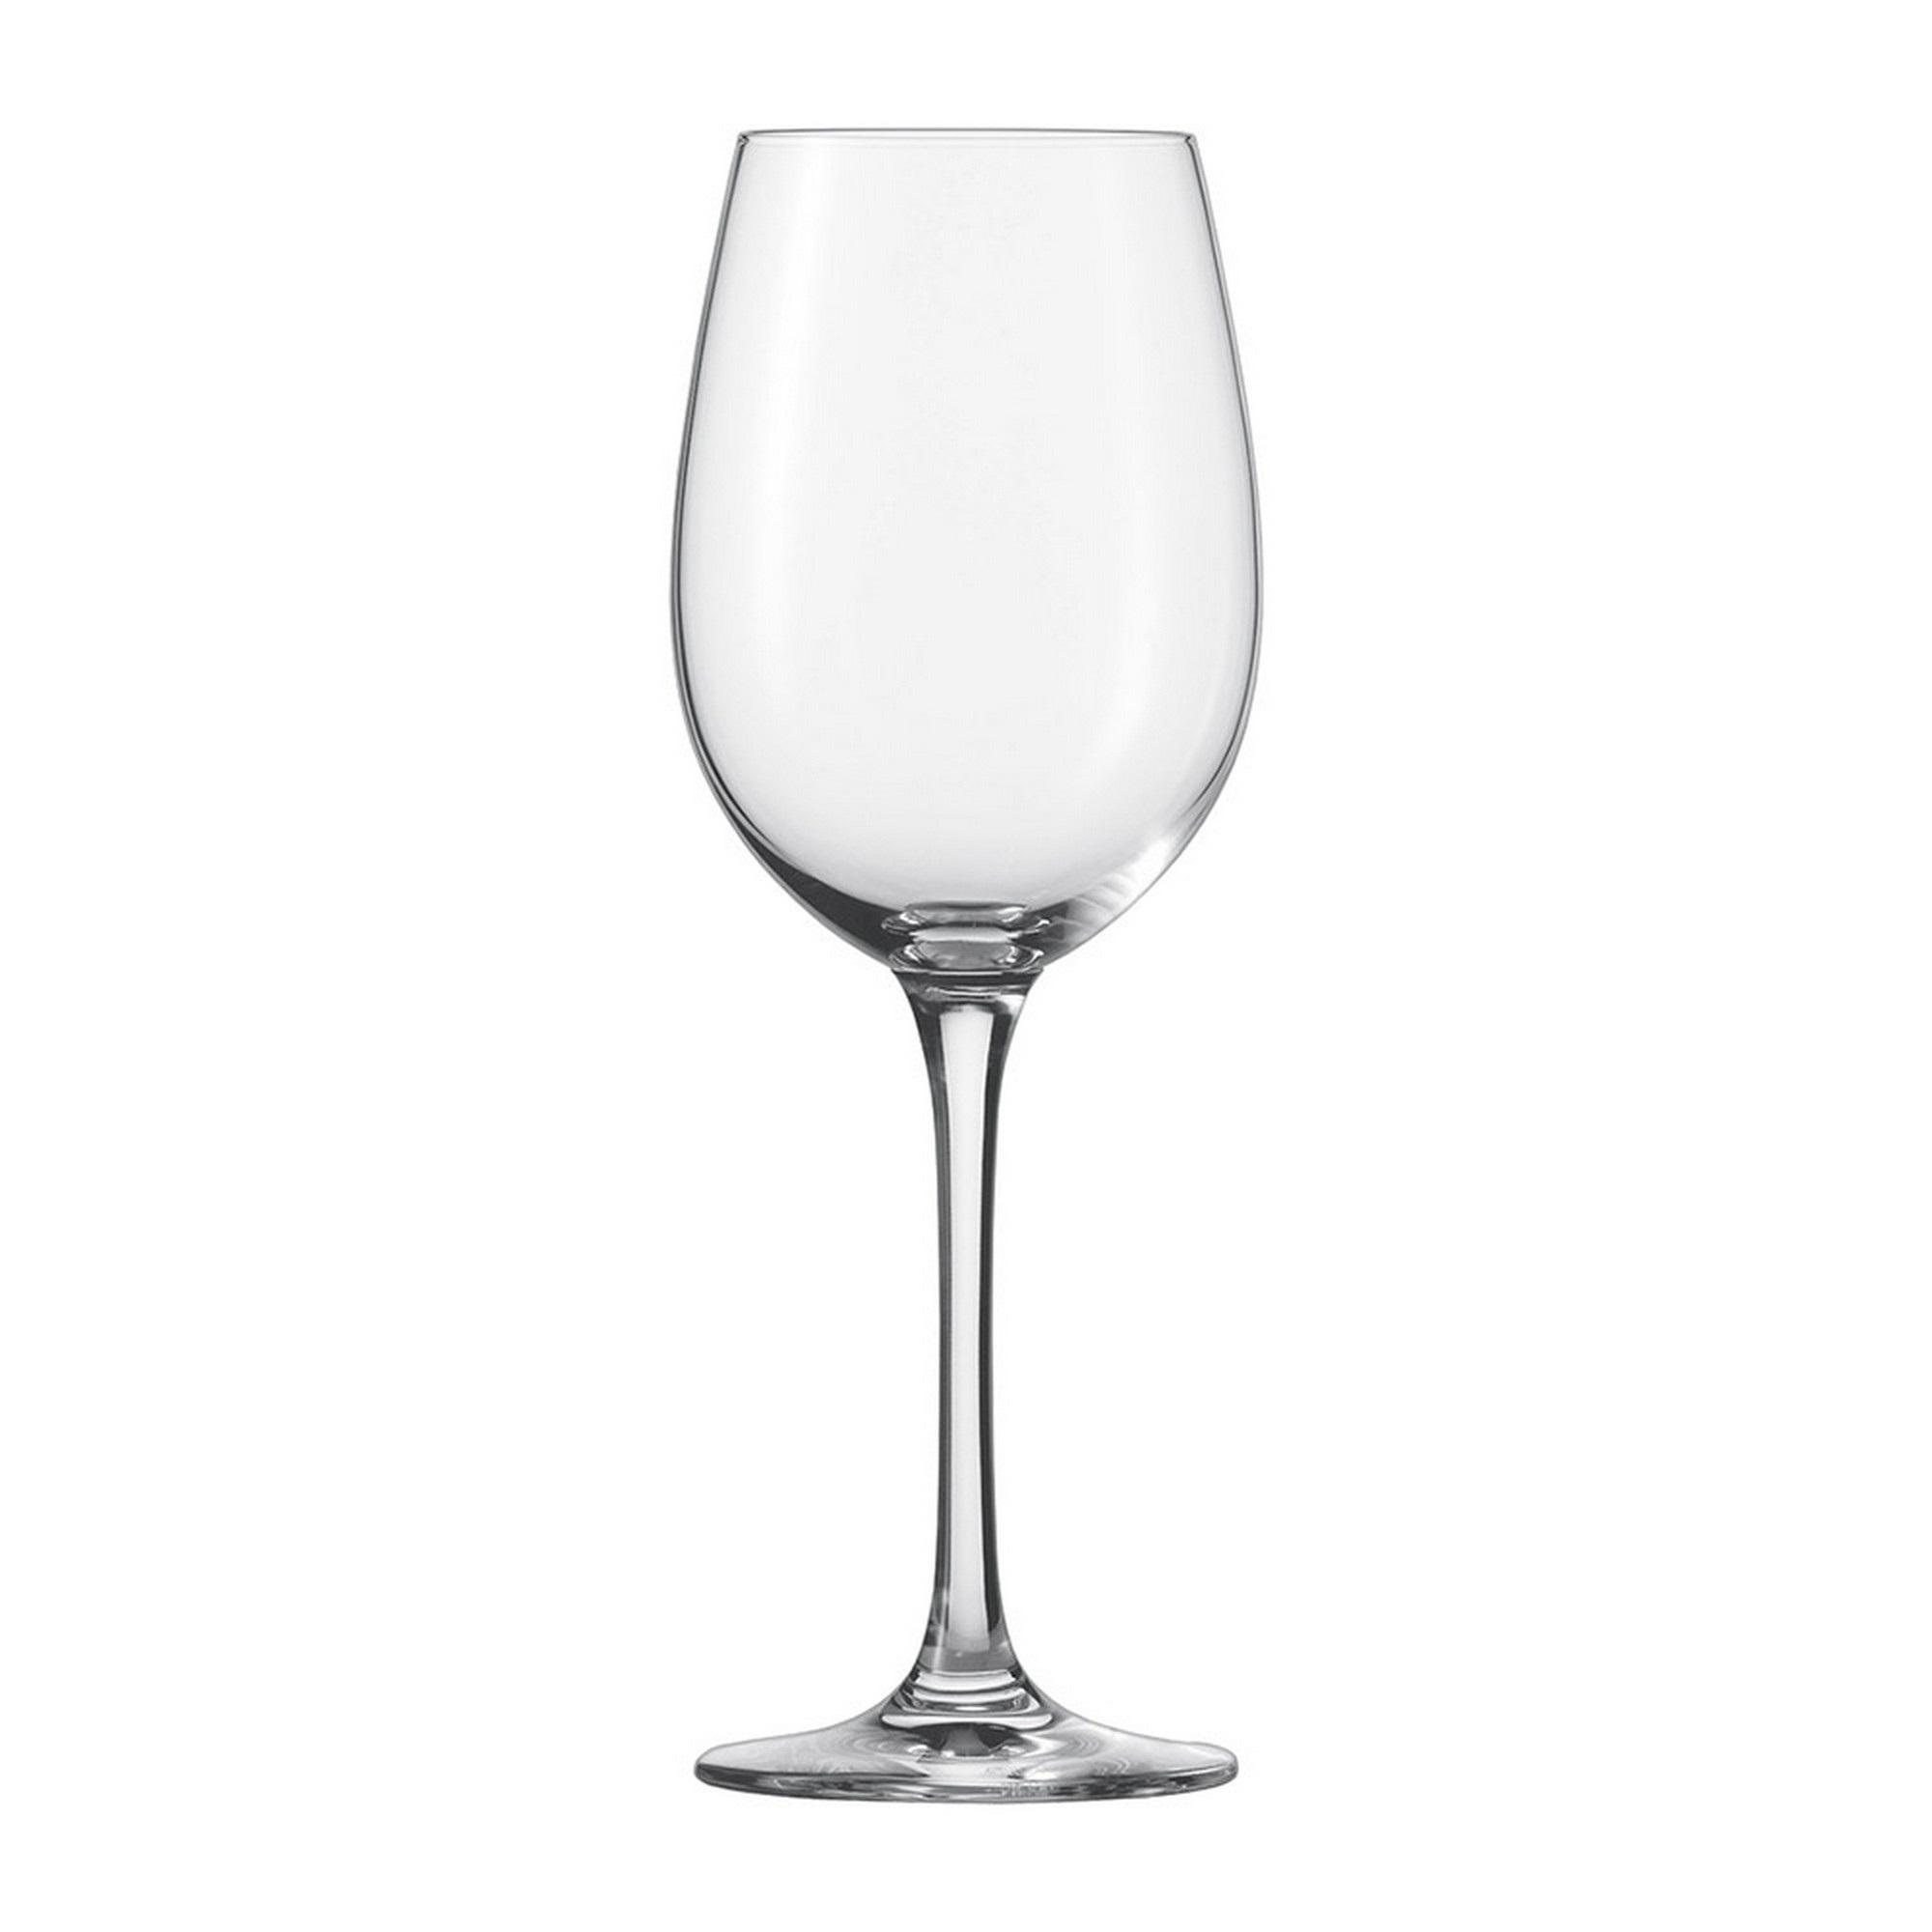 Taça para Borgonha 408ml Schott Zwiesel Classico 6 Peças de Cristal